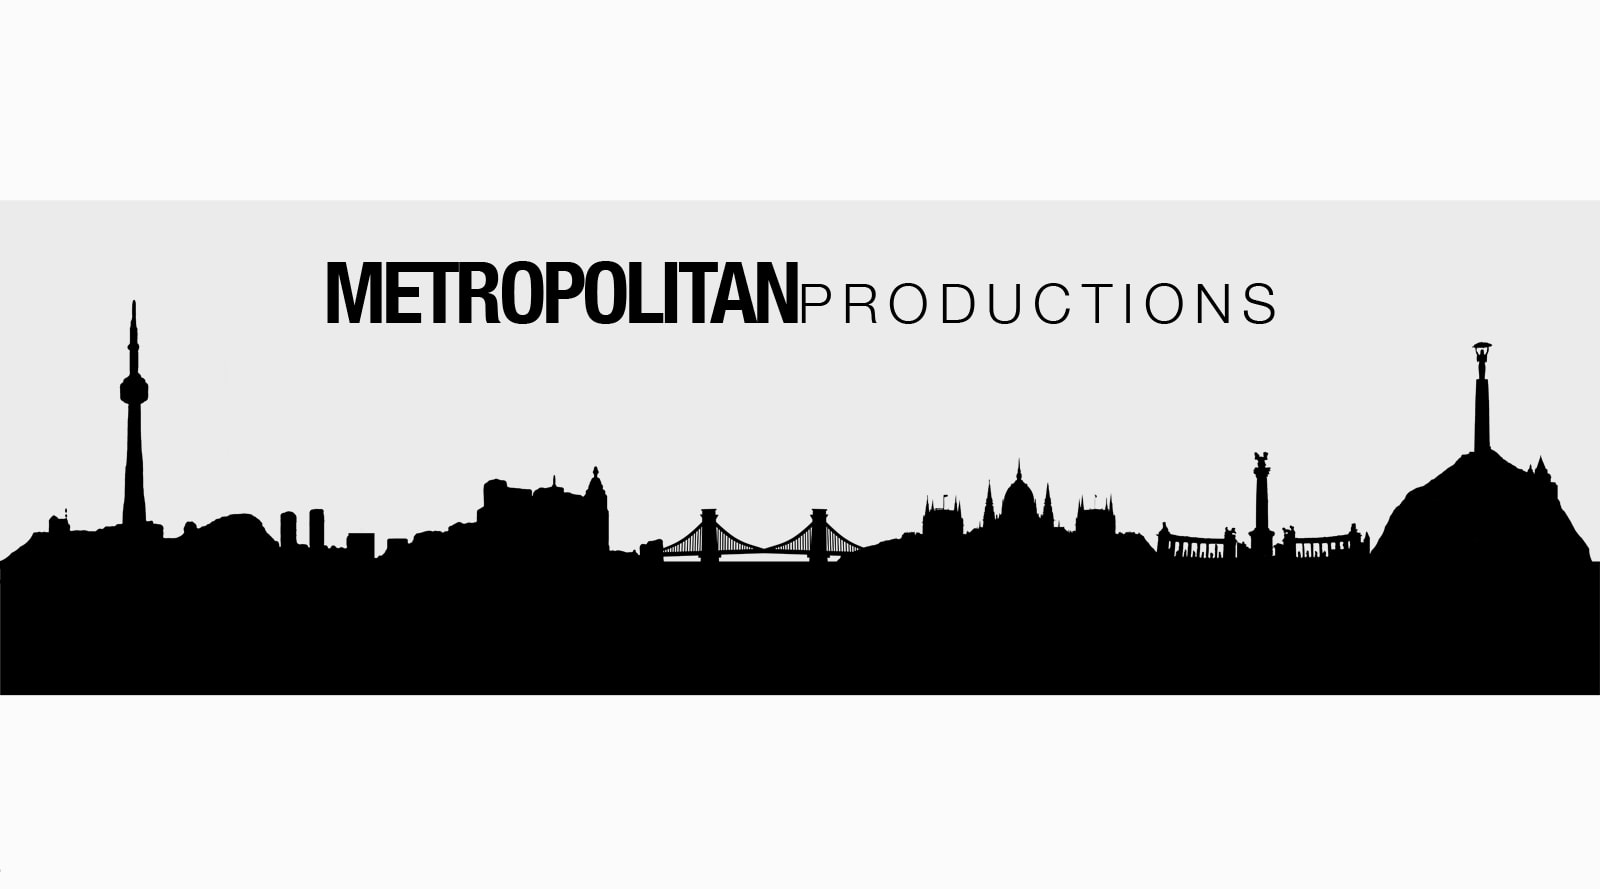 Metropolitan Productions